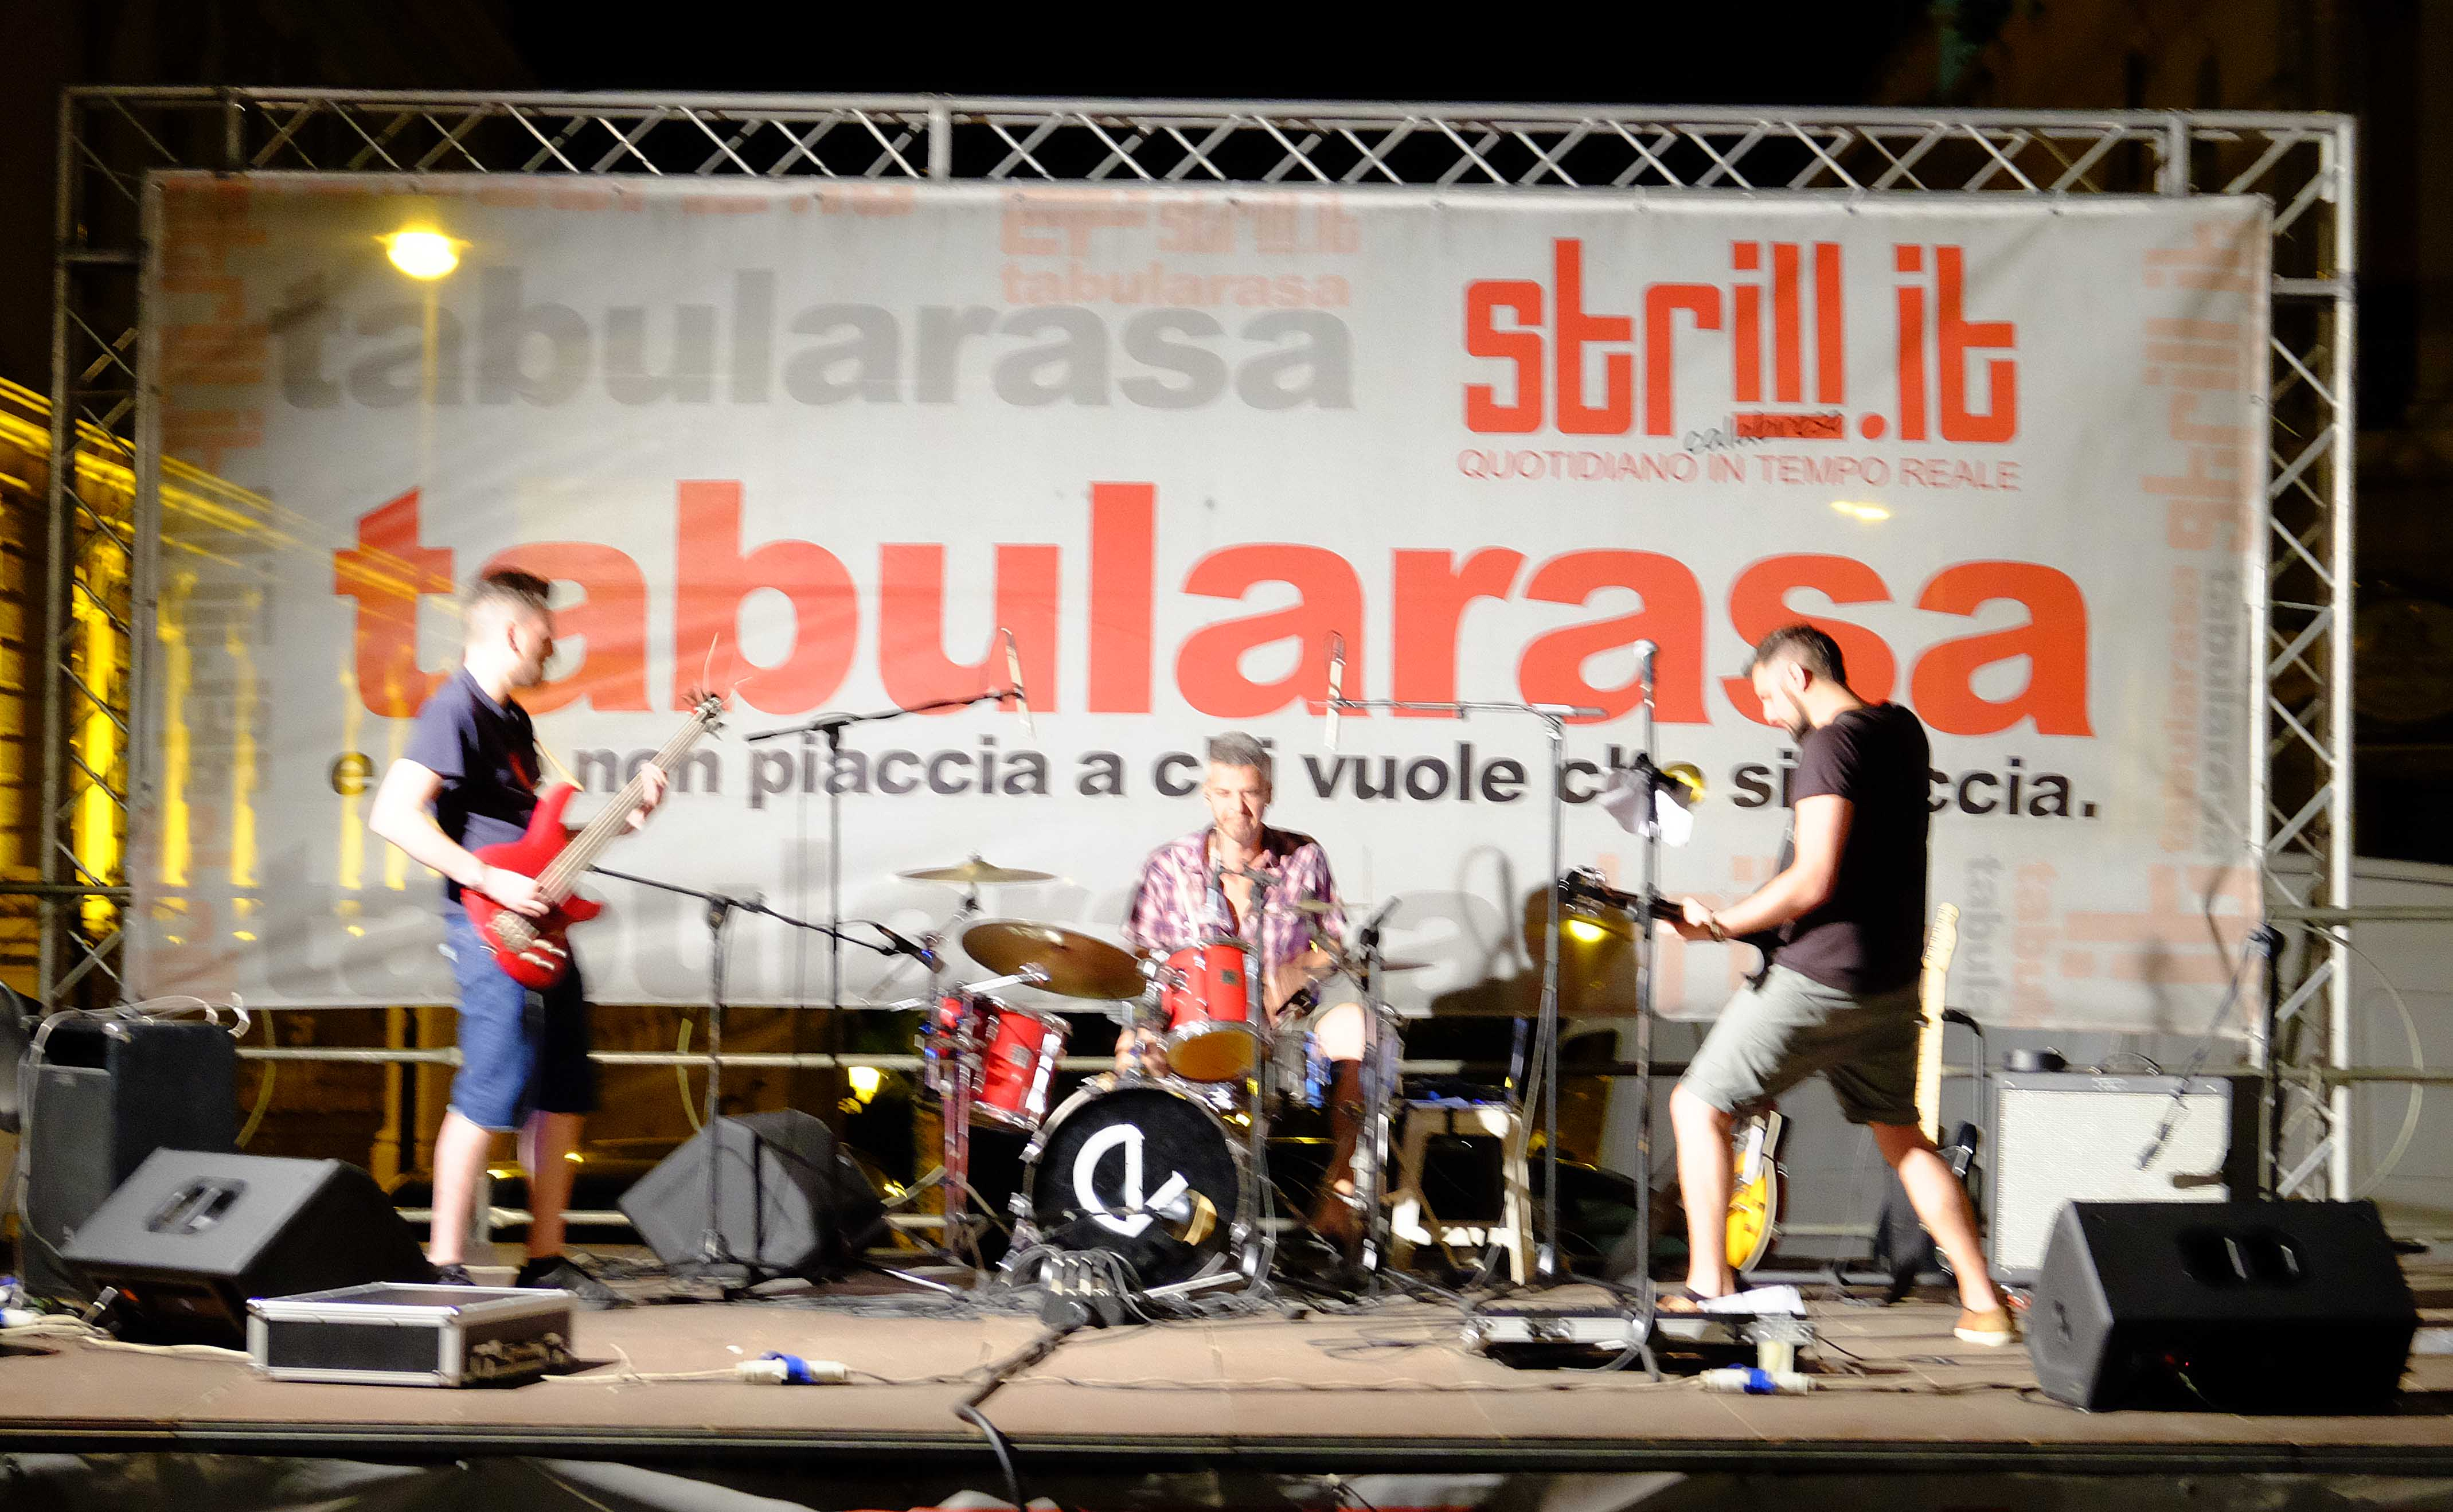 Tabularasa 2015 - Alessio Calivi